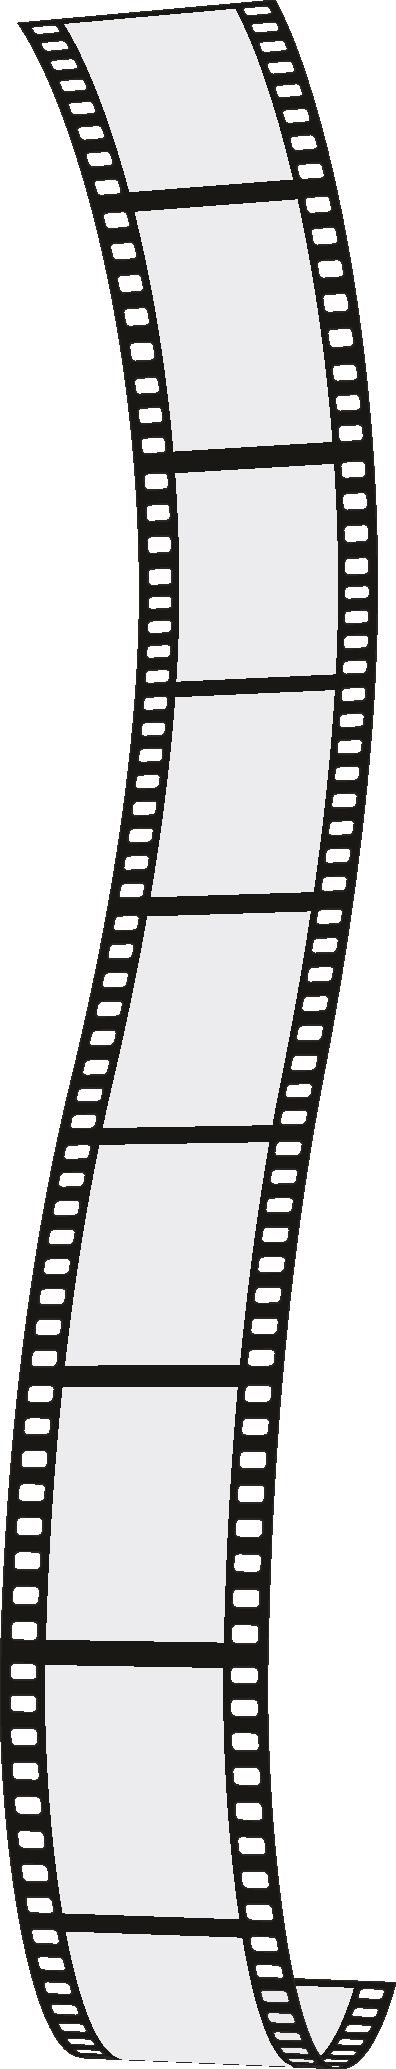 Film Strip 4 Roll Set Vector 04 Png 396 2 069 Pixels Film Strip Film Camera Art